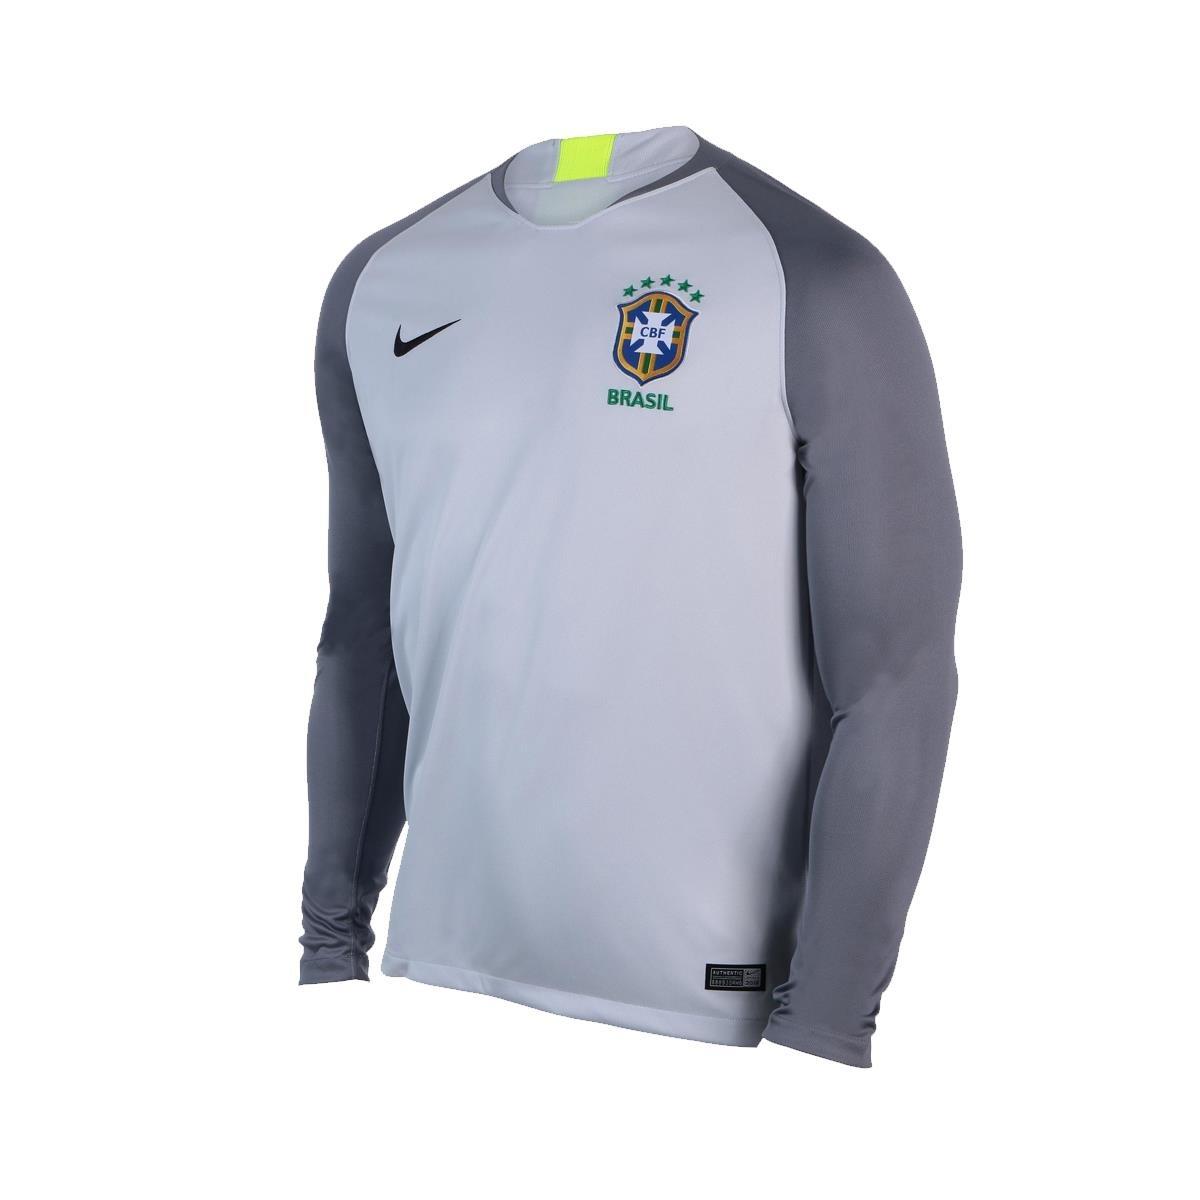 beefbdf6d3 camisa de goleiro nike brasil 2018 19 torcedor masculina gg. Carregando  zoom.